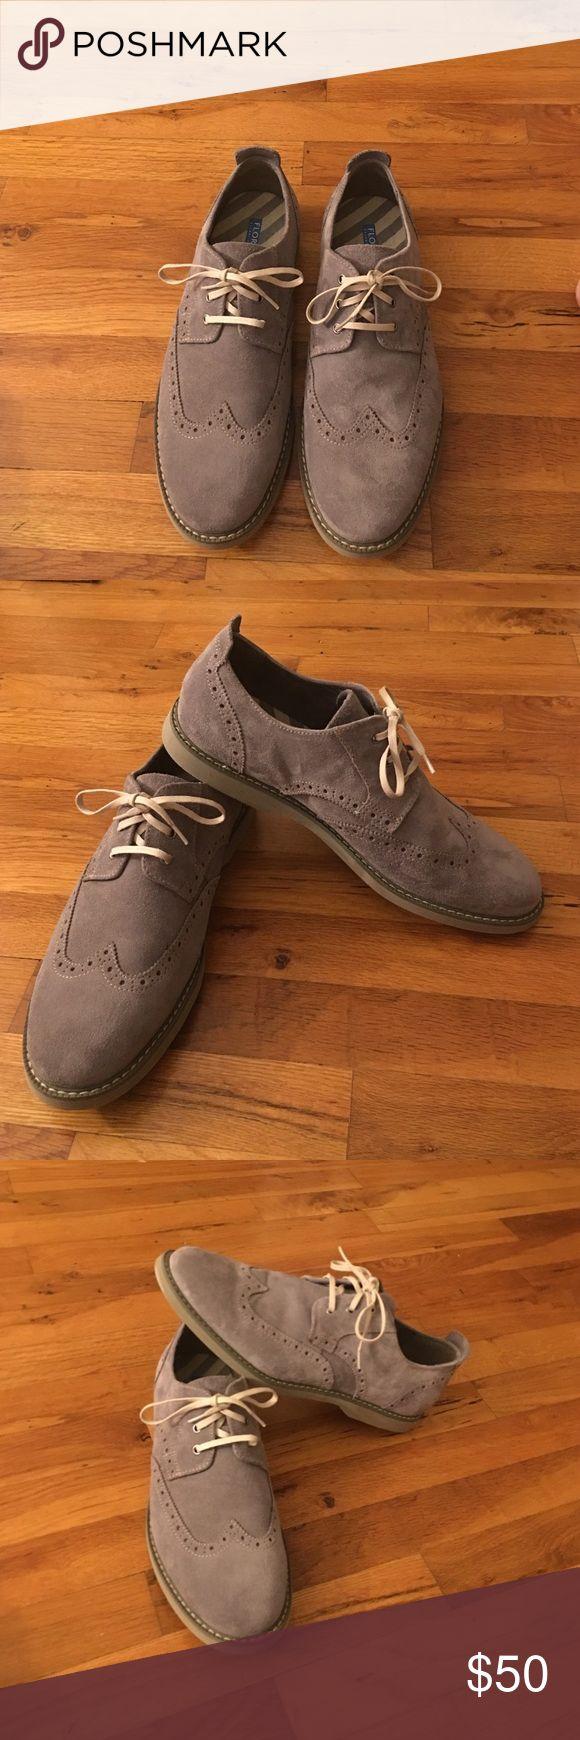 Men's suede shoes! Florsheim men's gray suede shoes. Worn twice. In perfect condition Florsheim Shoes Oxfords & Derbys